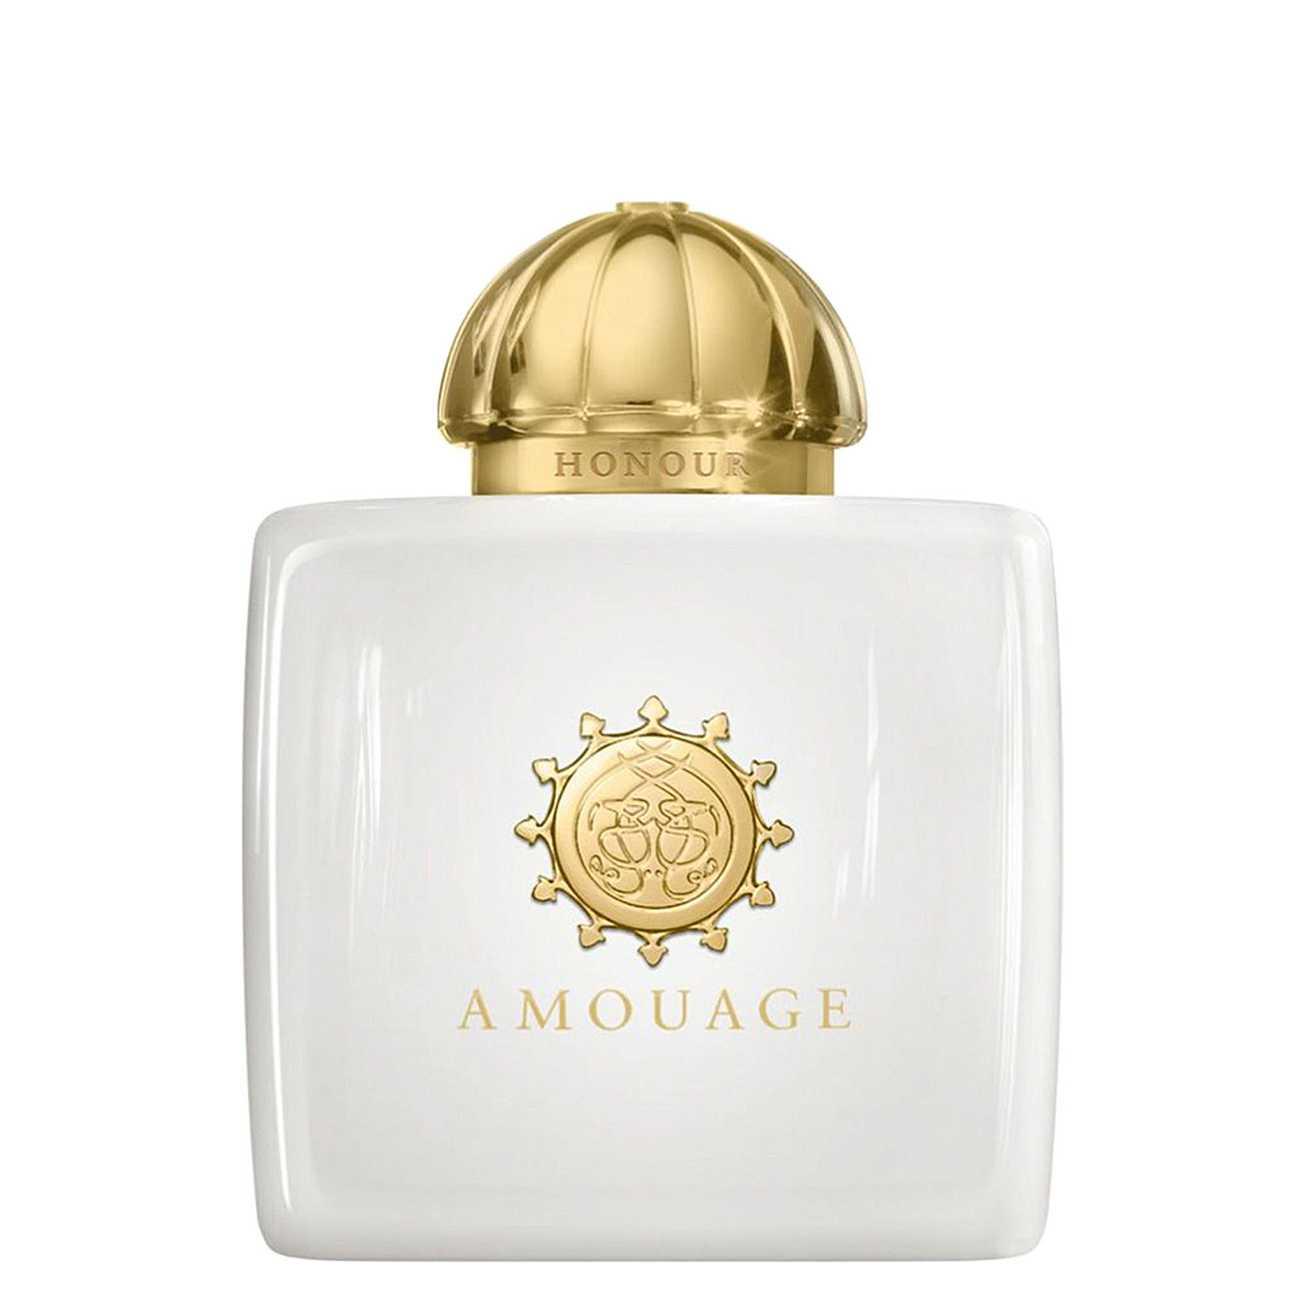 Amouage -Honour